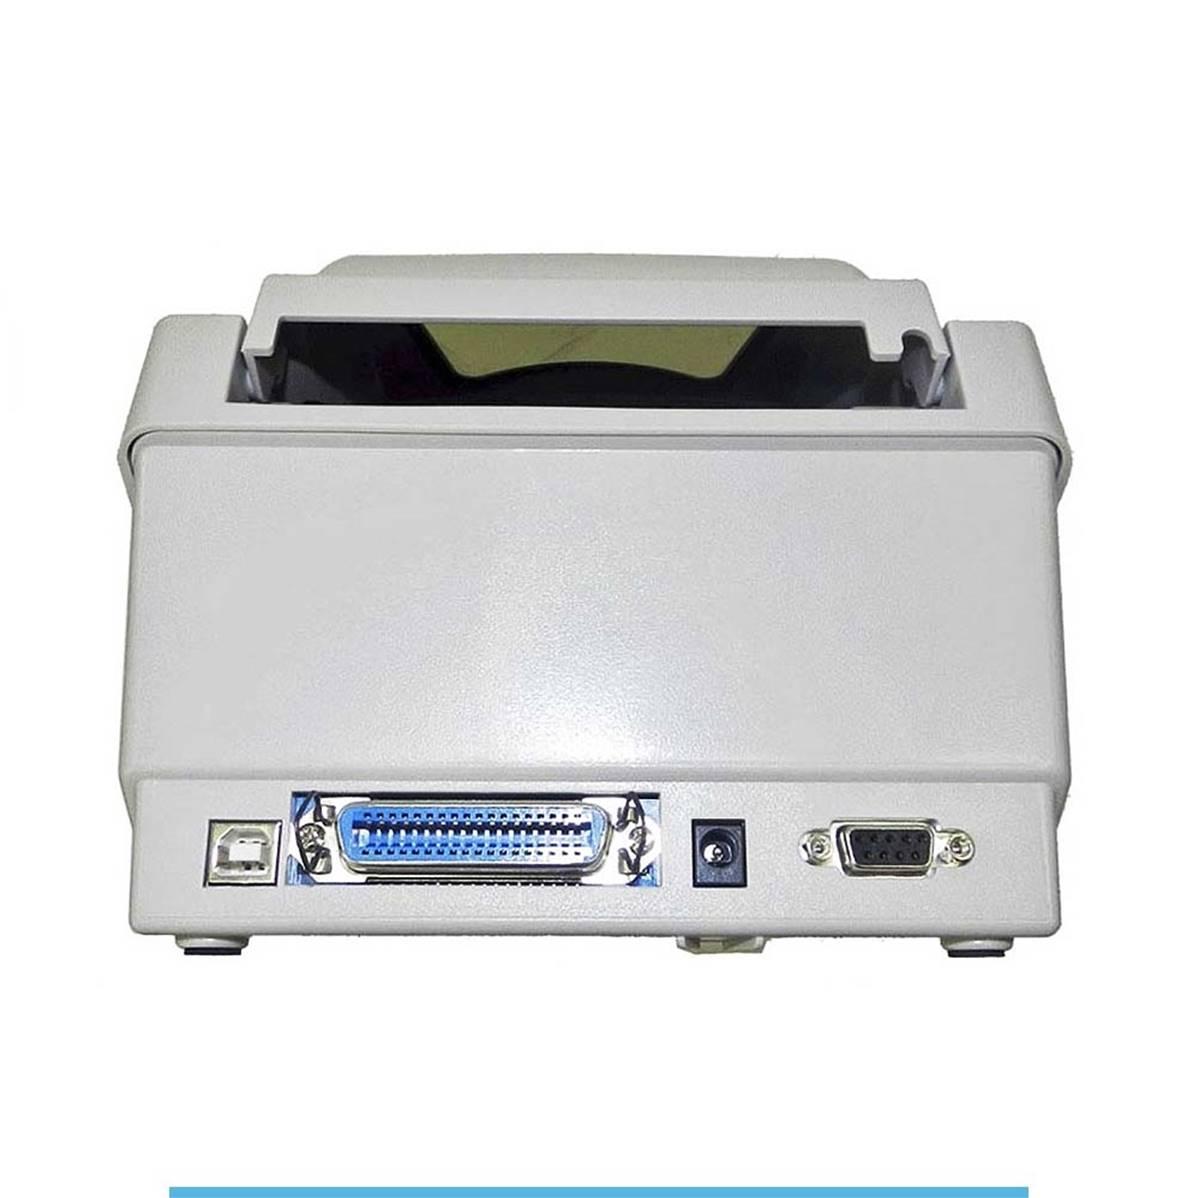 Argox OS-214TT PPLA Driver PC